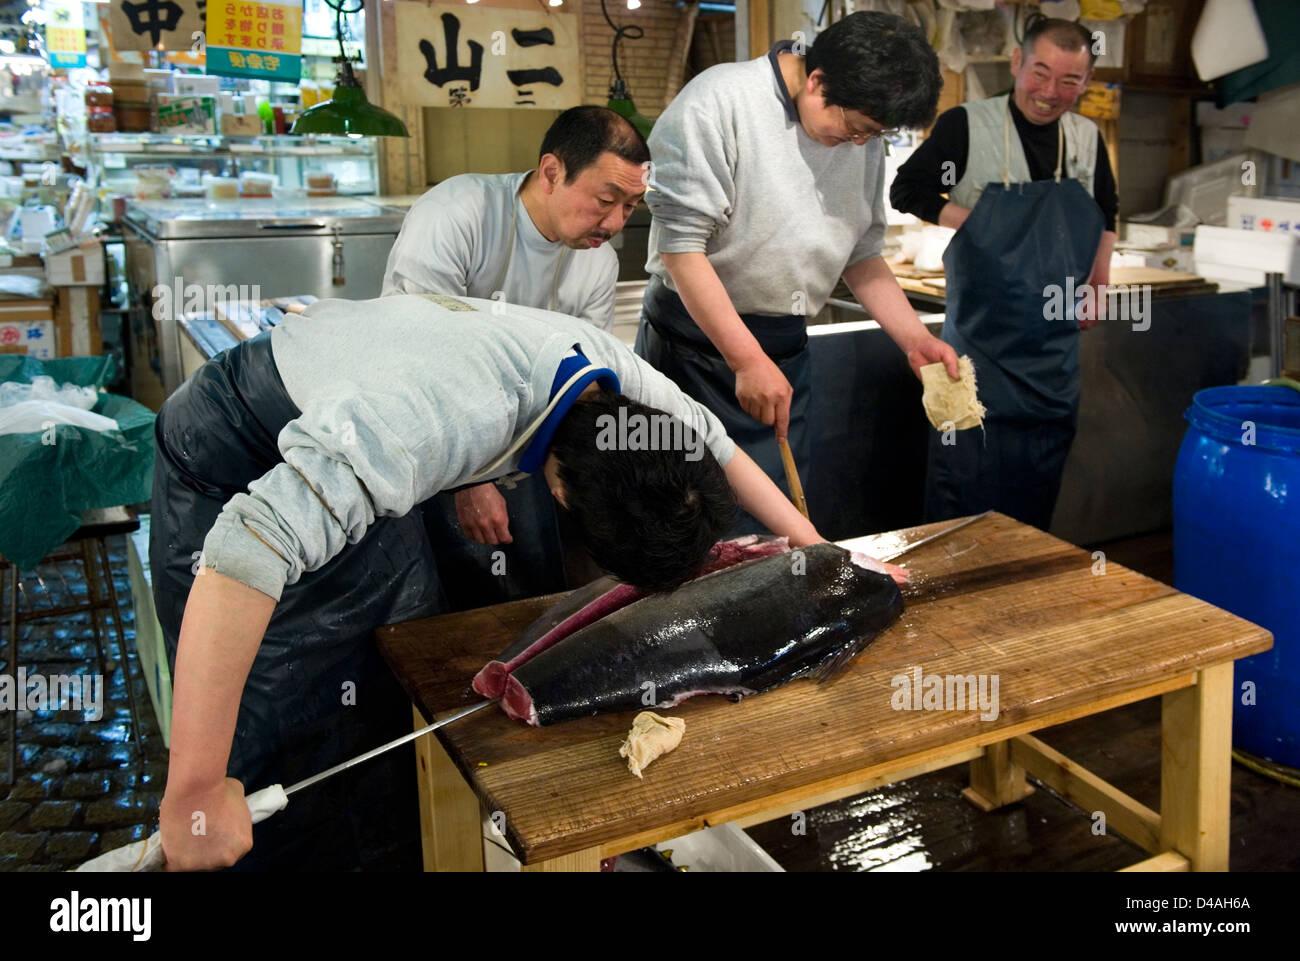 Fishmonger Cuts Fresh Raw Tuna With Giant Sharp Knife At